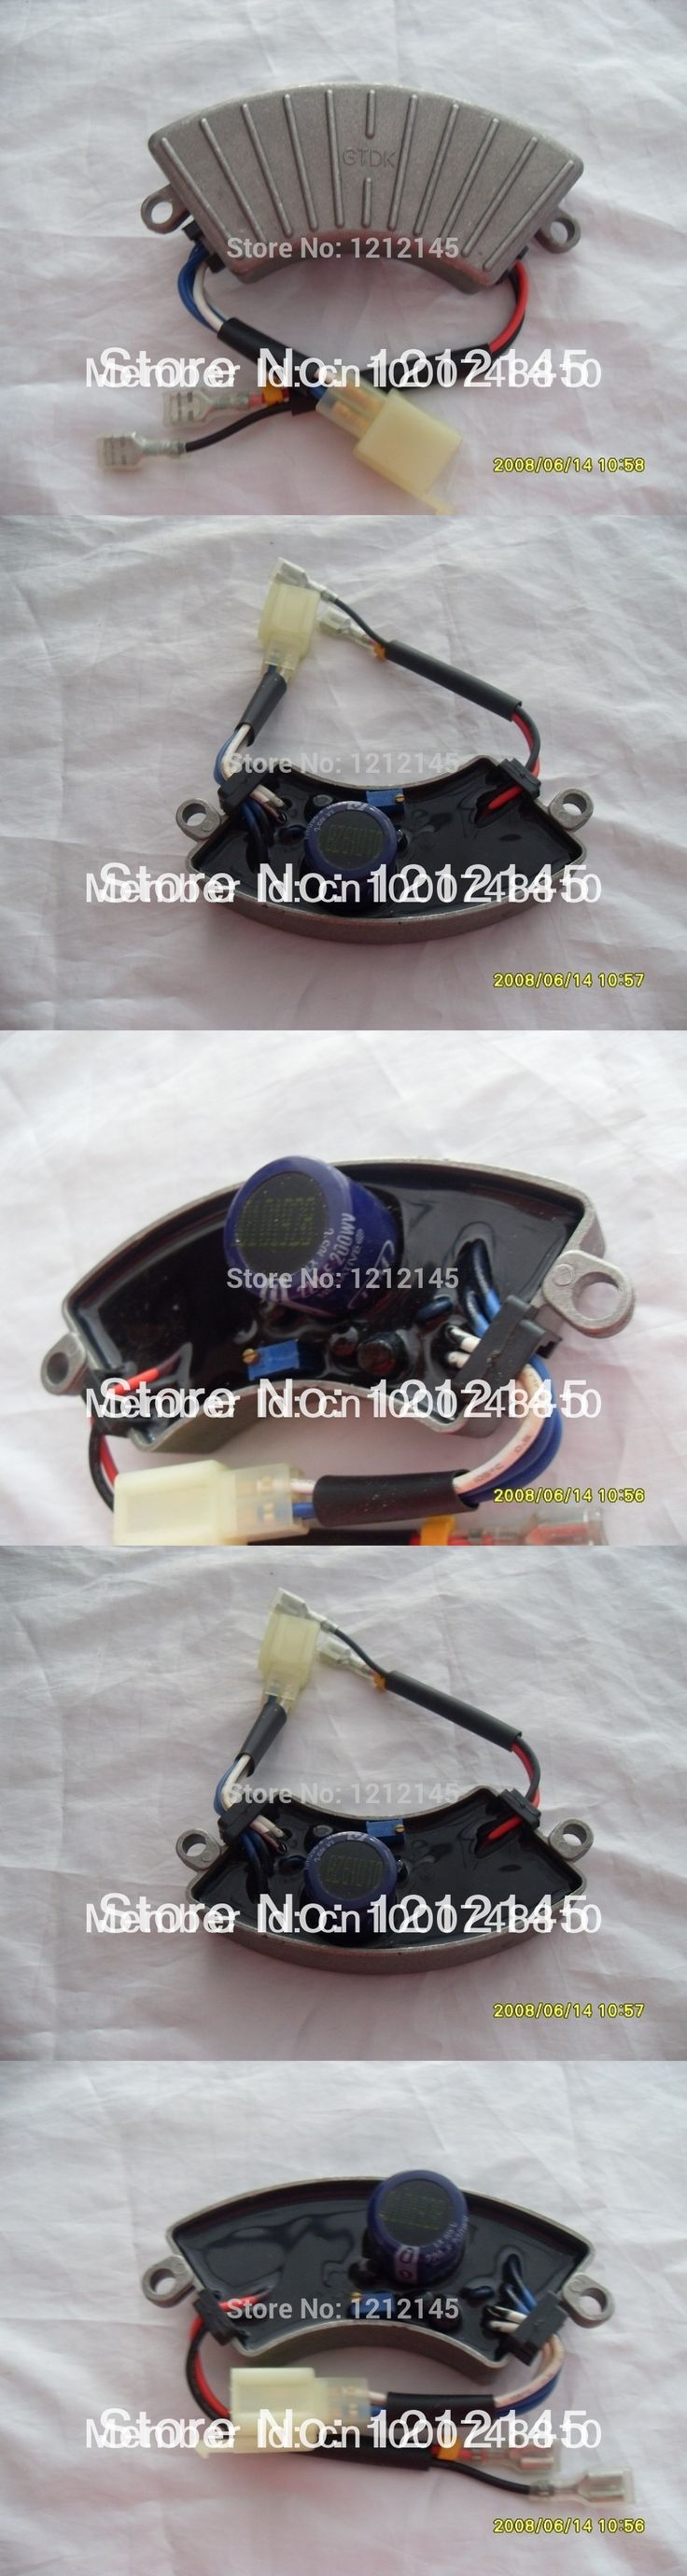 GTDK2.5-1 2KW 2.5KW AVR Aluminum Case For KIPOR KAMA ELEMAX HONDA Generator Parts Accessory